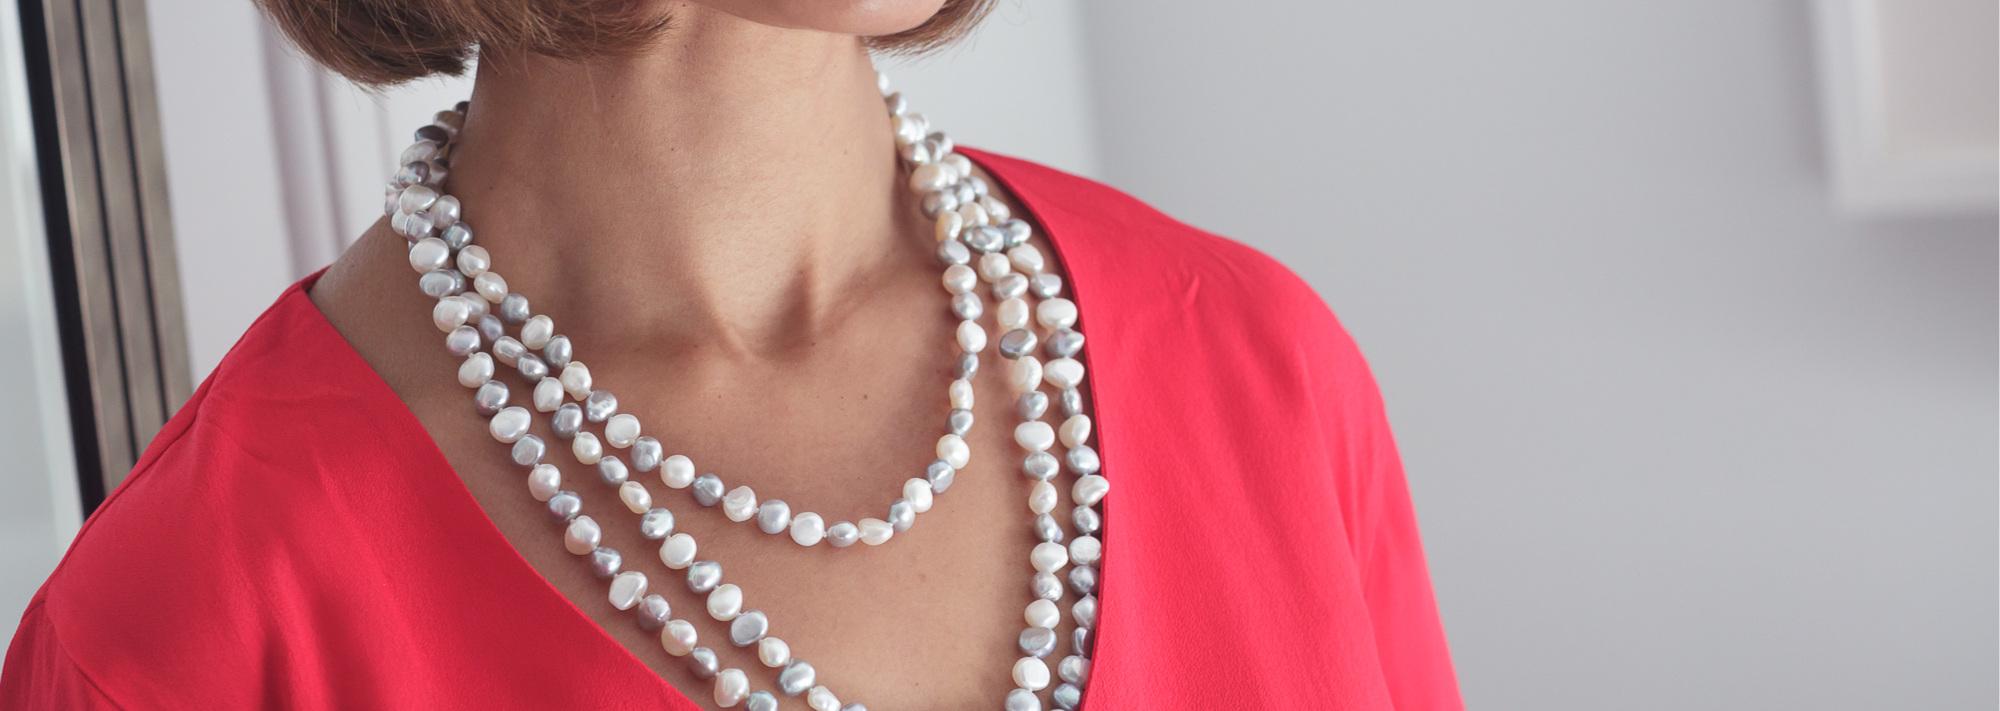 Nina - red - pearls 004.jpg